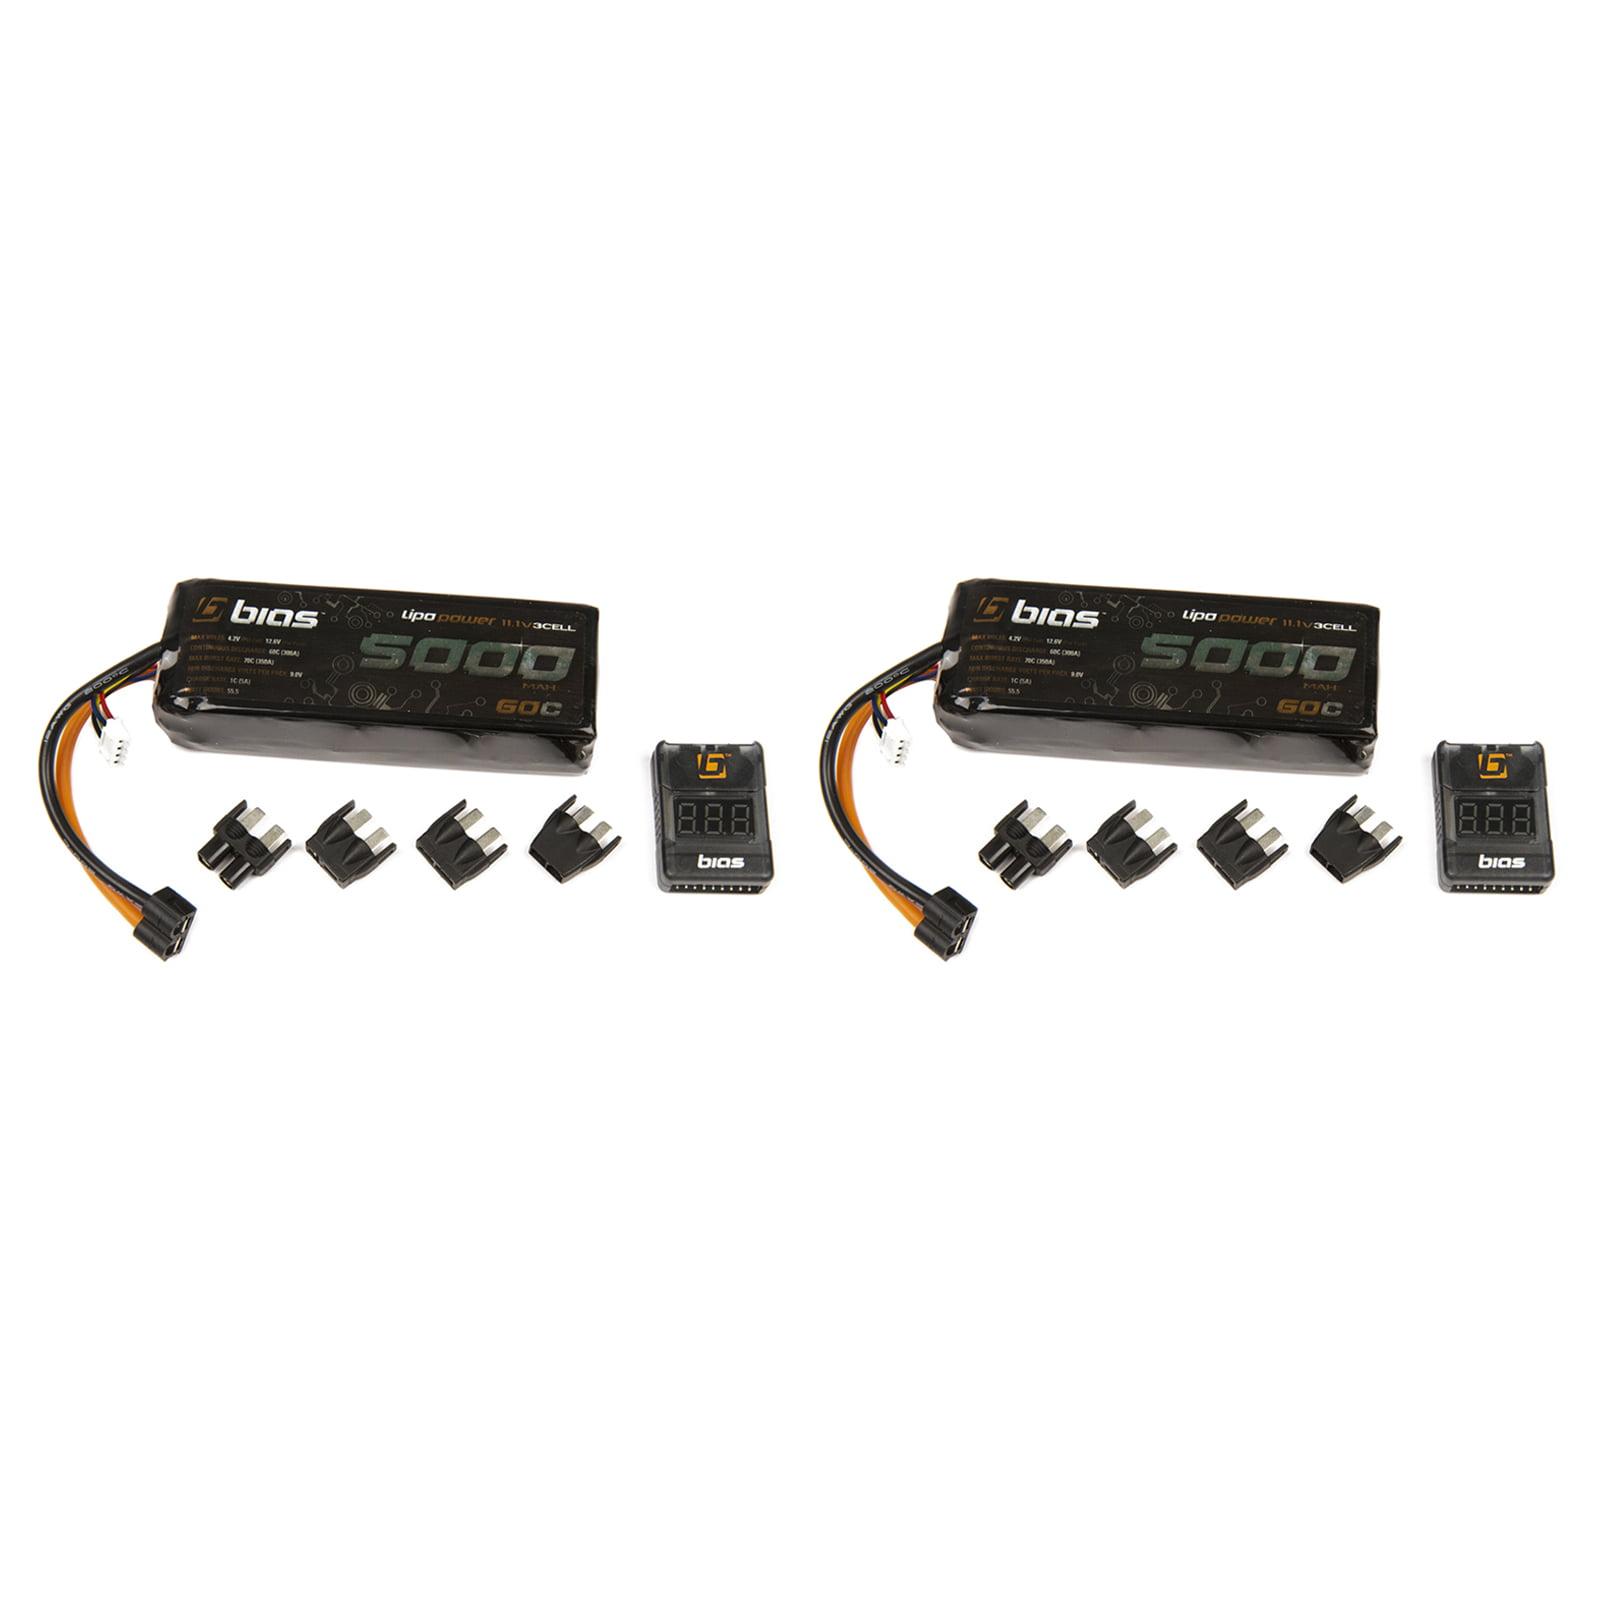 BIAS 60C 3S 5000mAh 11.1V LiPo Battery with UNI Plug (EC3...